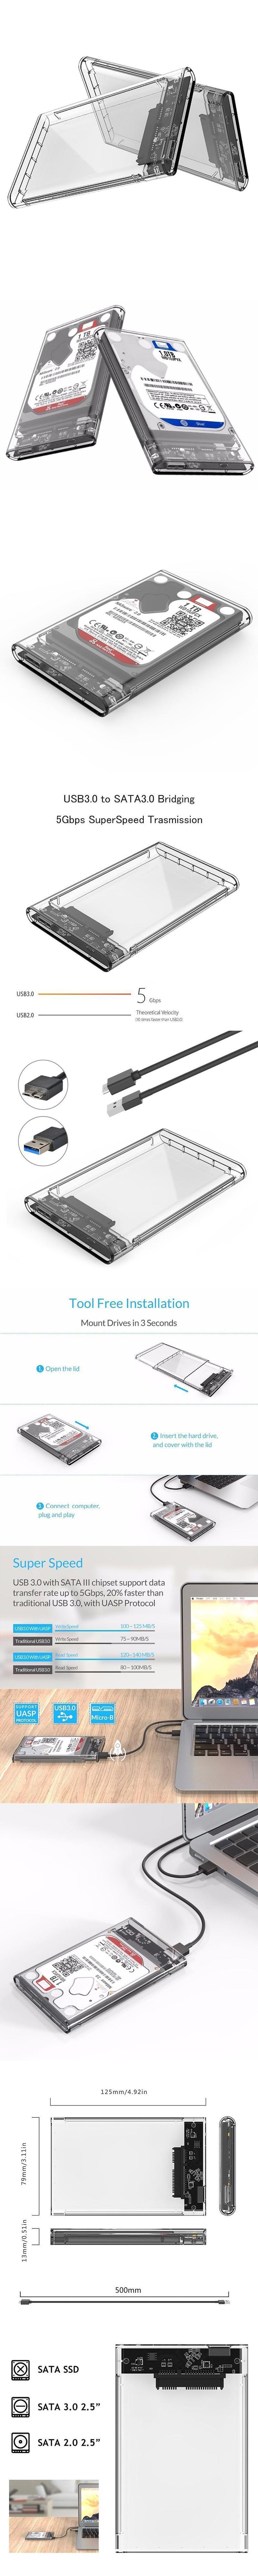 2.5 pollici Trasparente USB 3.0 HDD Case strumento Telaio disco rigido SATA UK